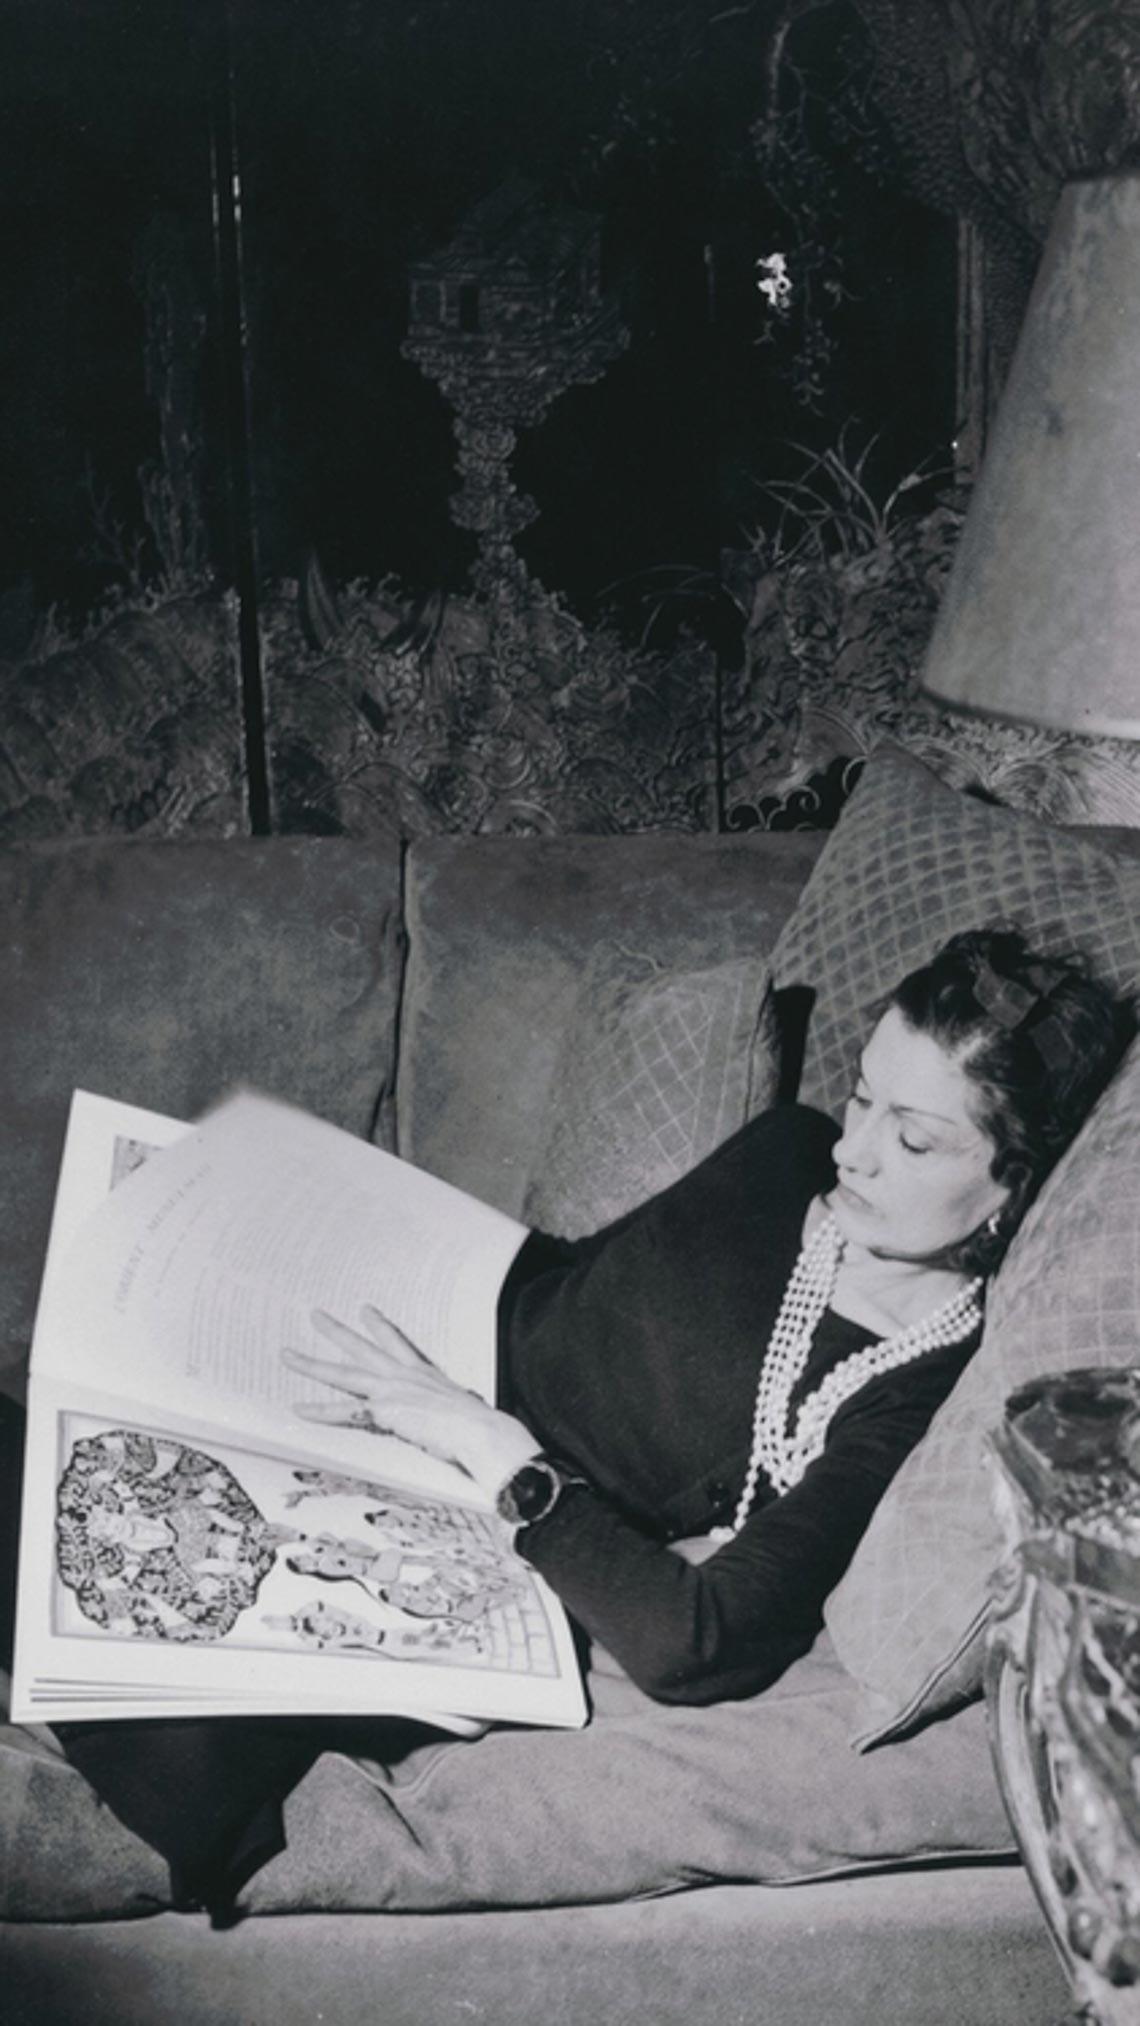 Trải nghiệm triển lãm Mademoiselle Privé của Chanel tại Tokyo-1